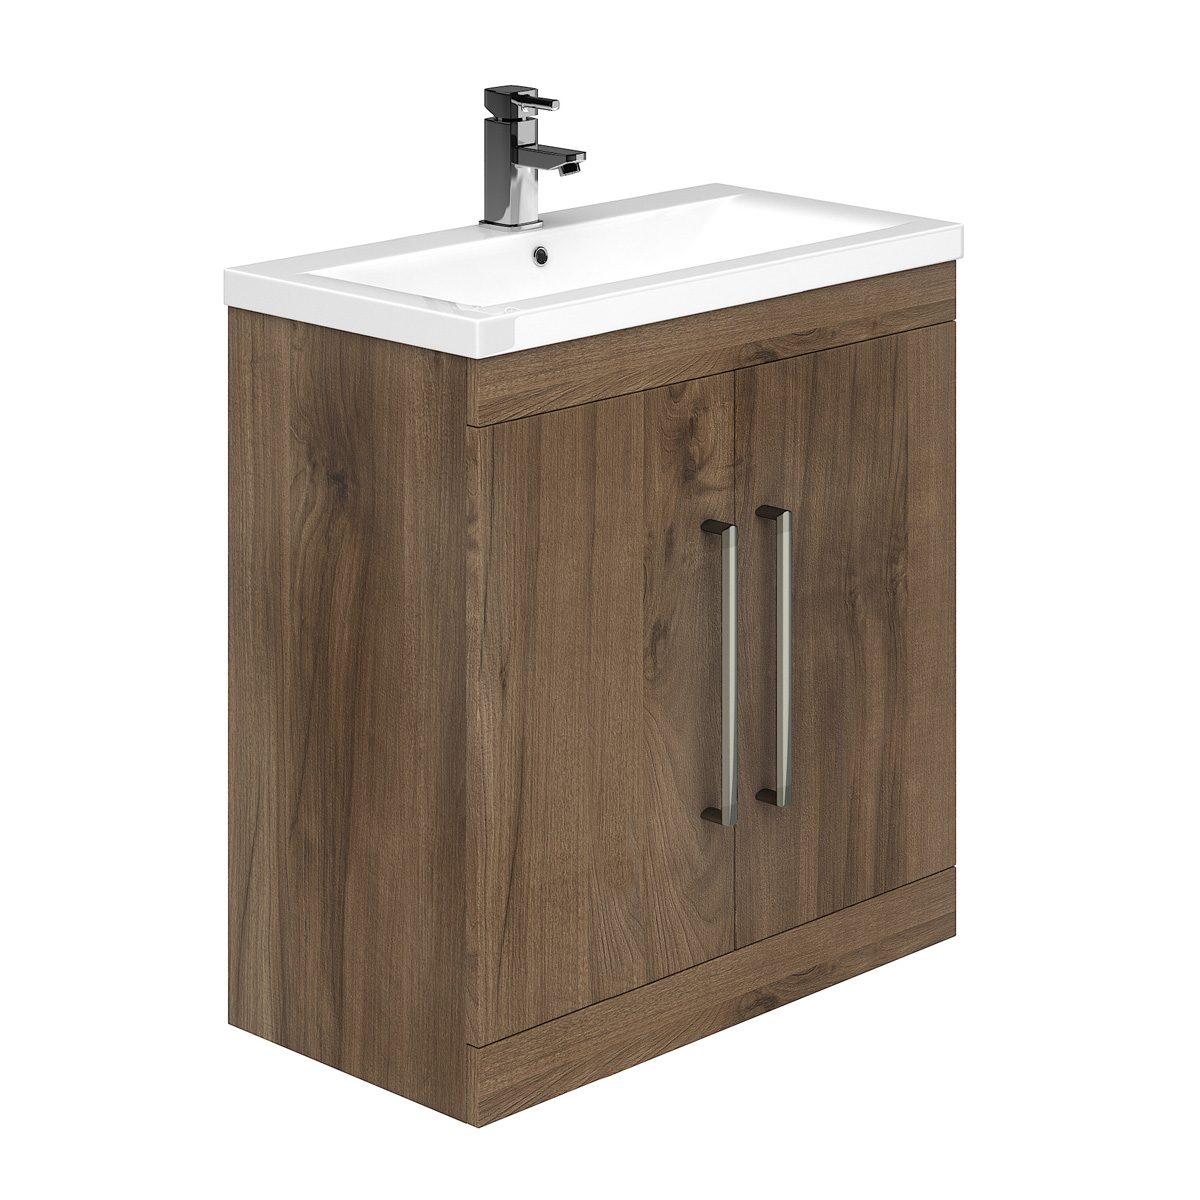 British Bathroom CabinatesTilemaze